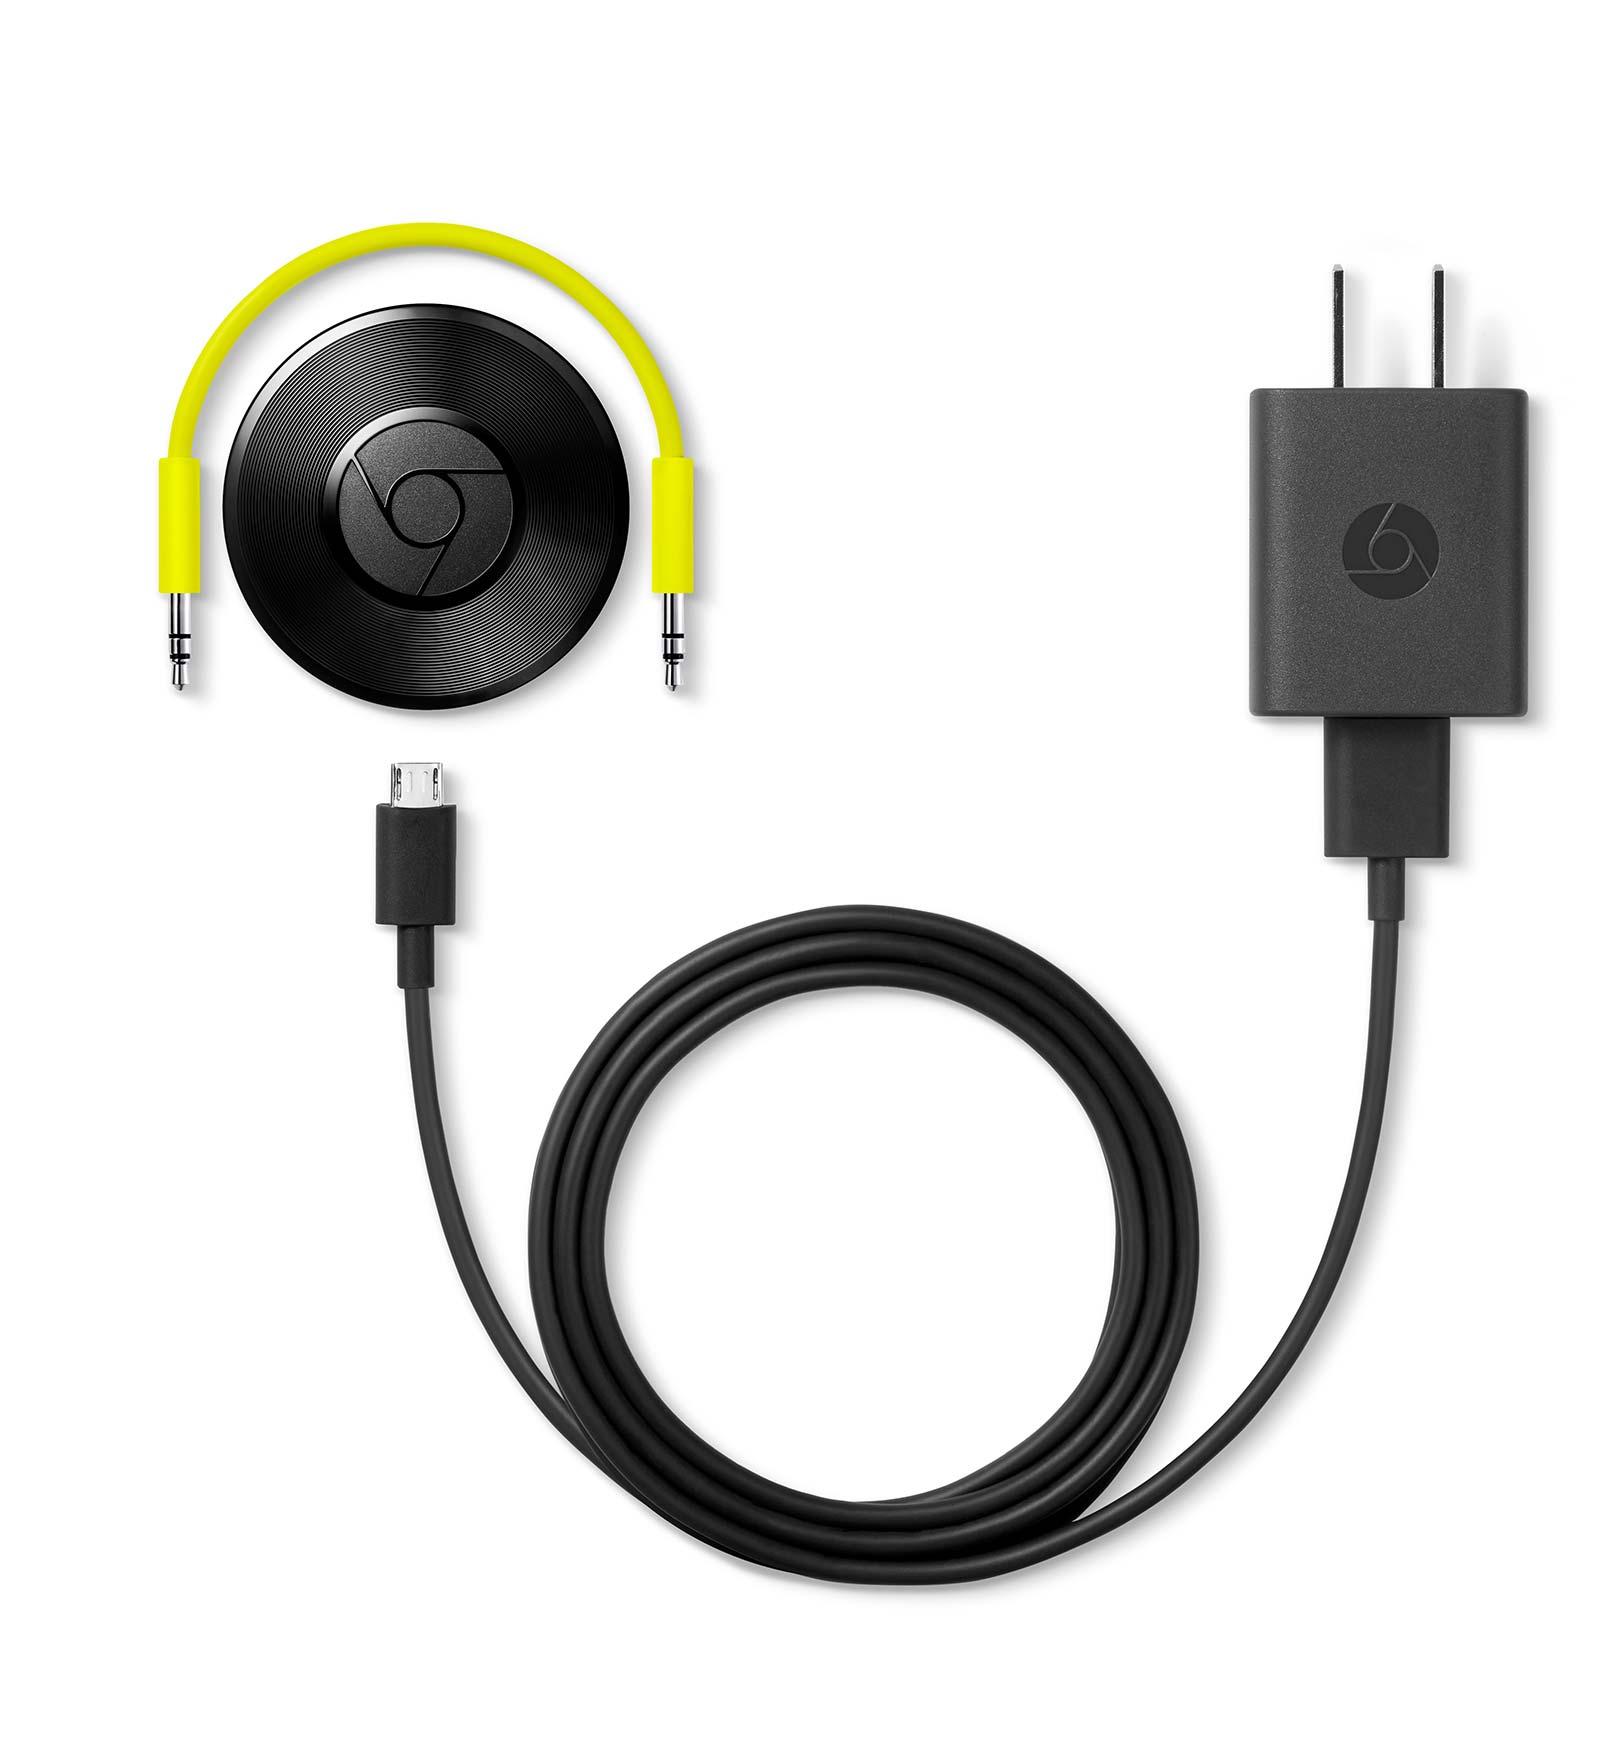 「Chromecast Audio」